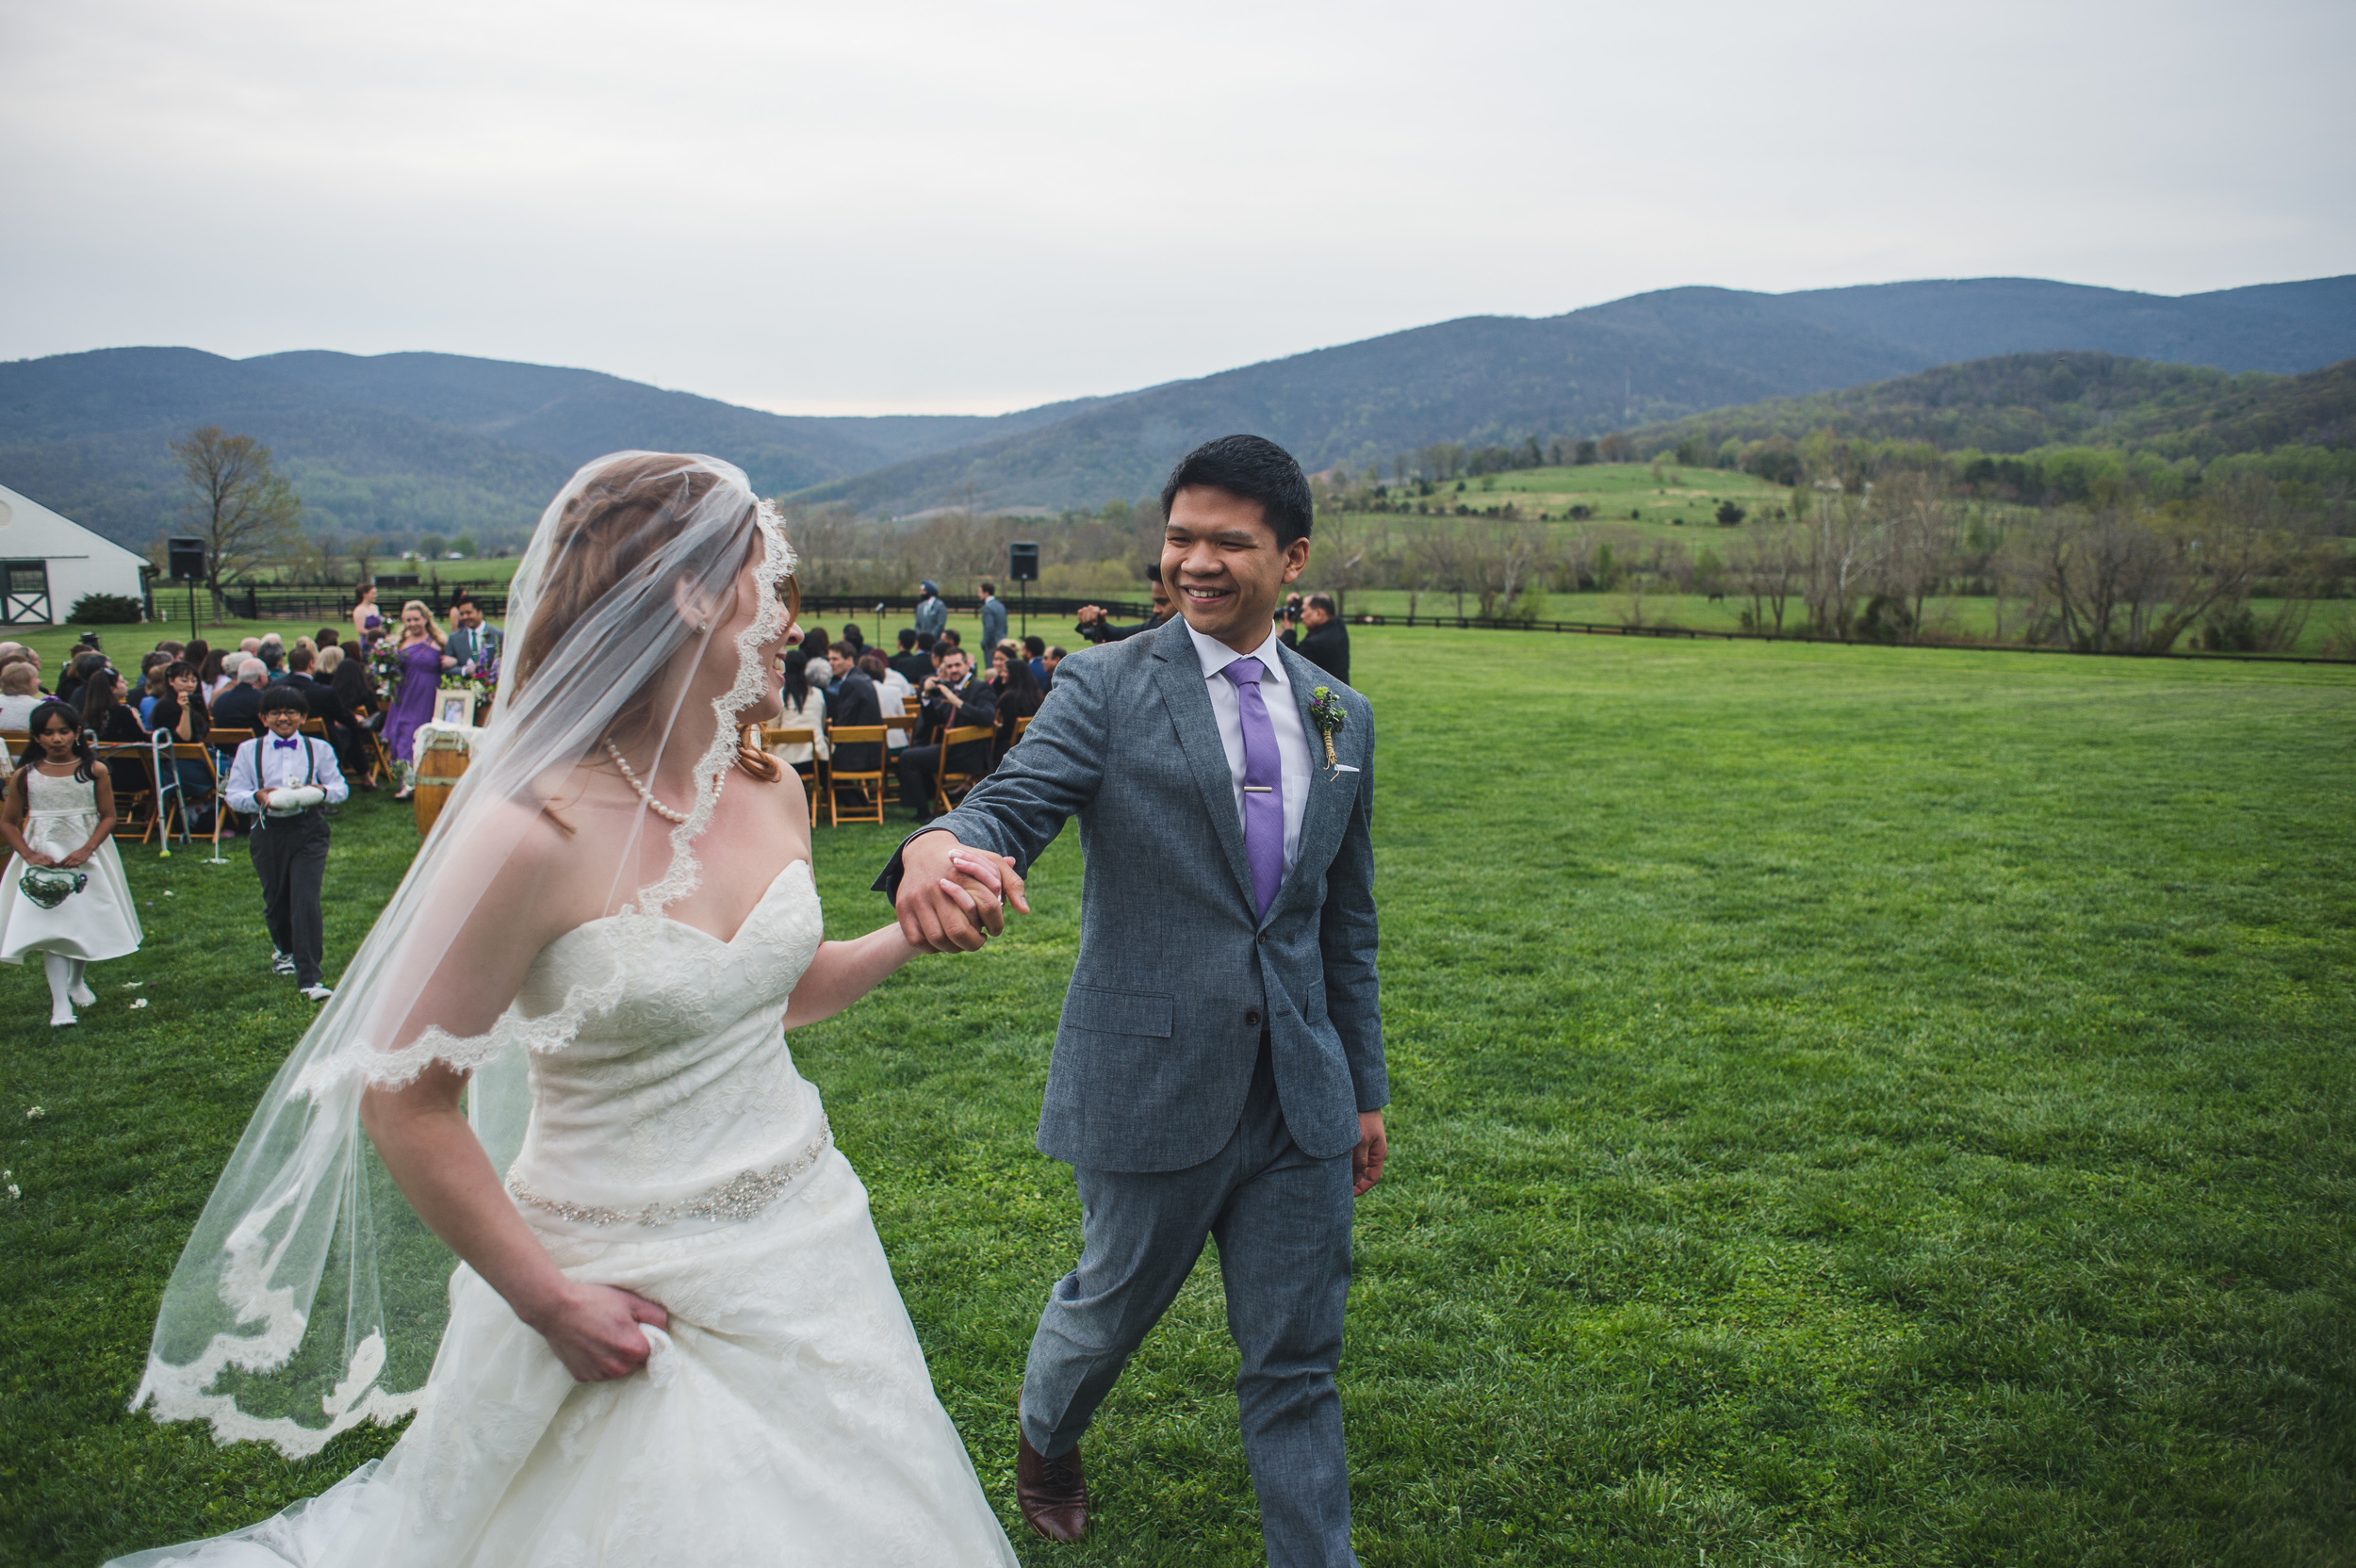 Photojournalistic wedding photography Baltimore MD By Mantas Kubilinskas-21.jpg